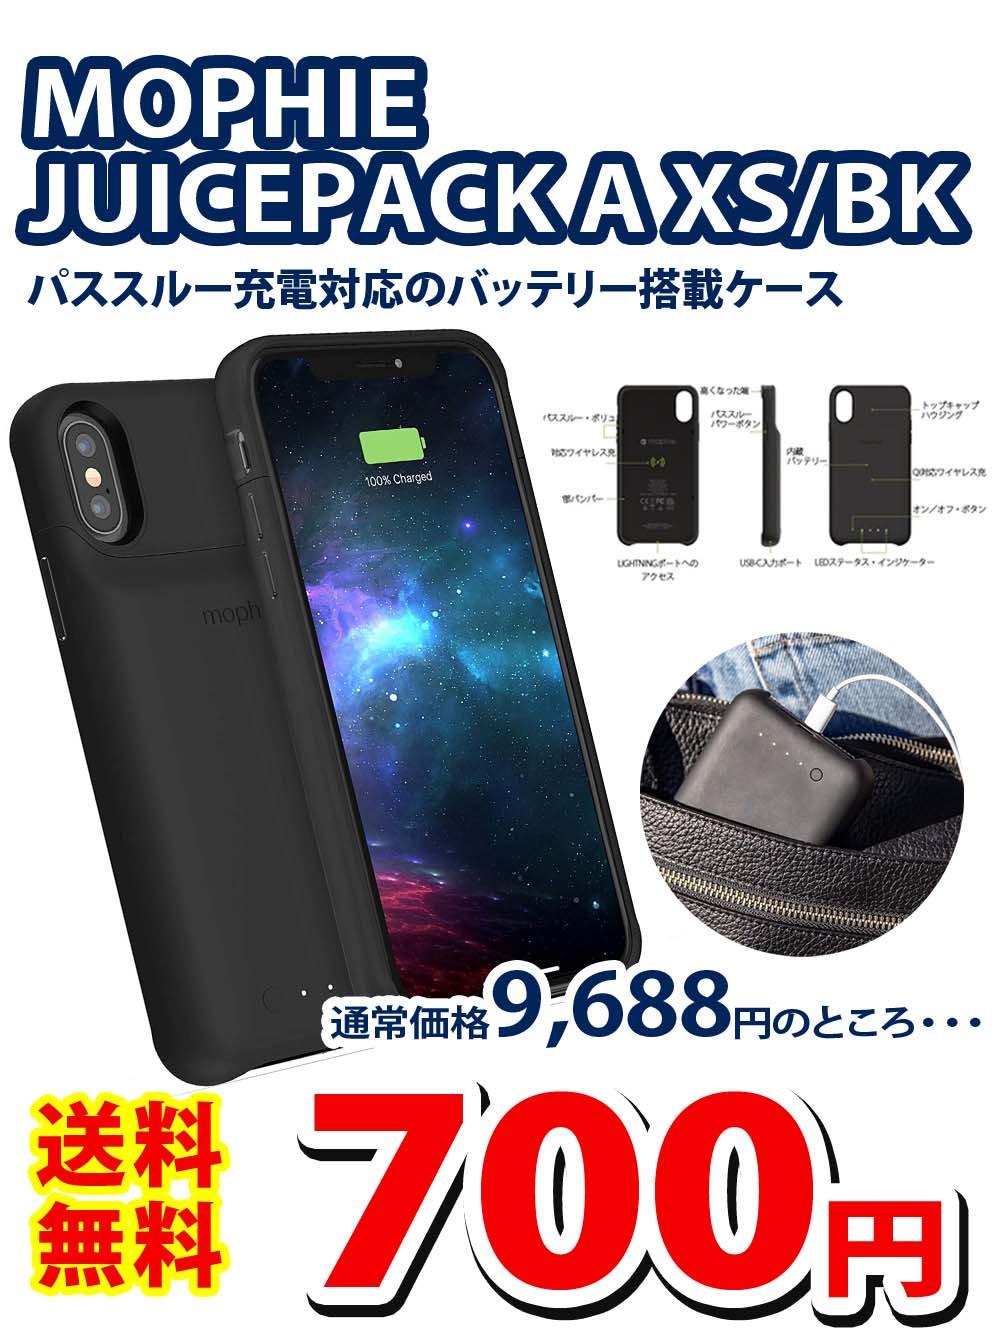 【送料無料】mophie juice pack Access Apple iPhone X / XS【1180円】定価9688円